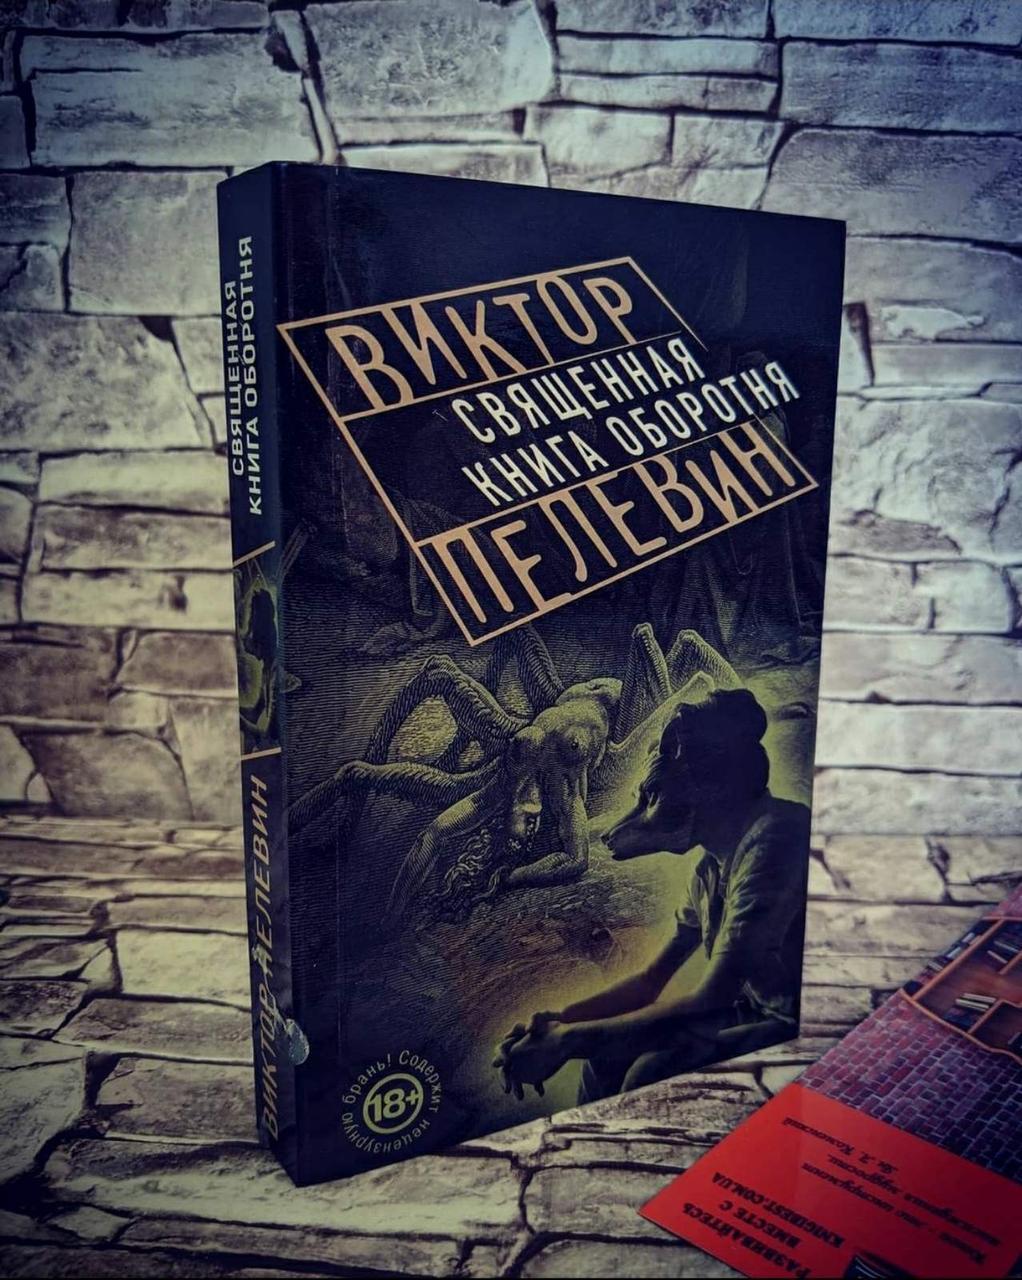 Книга «Священная книга оборотня» Виктор Пелевин